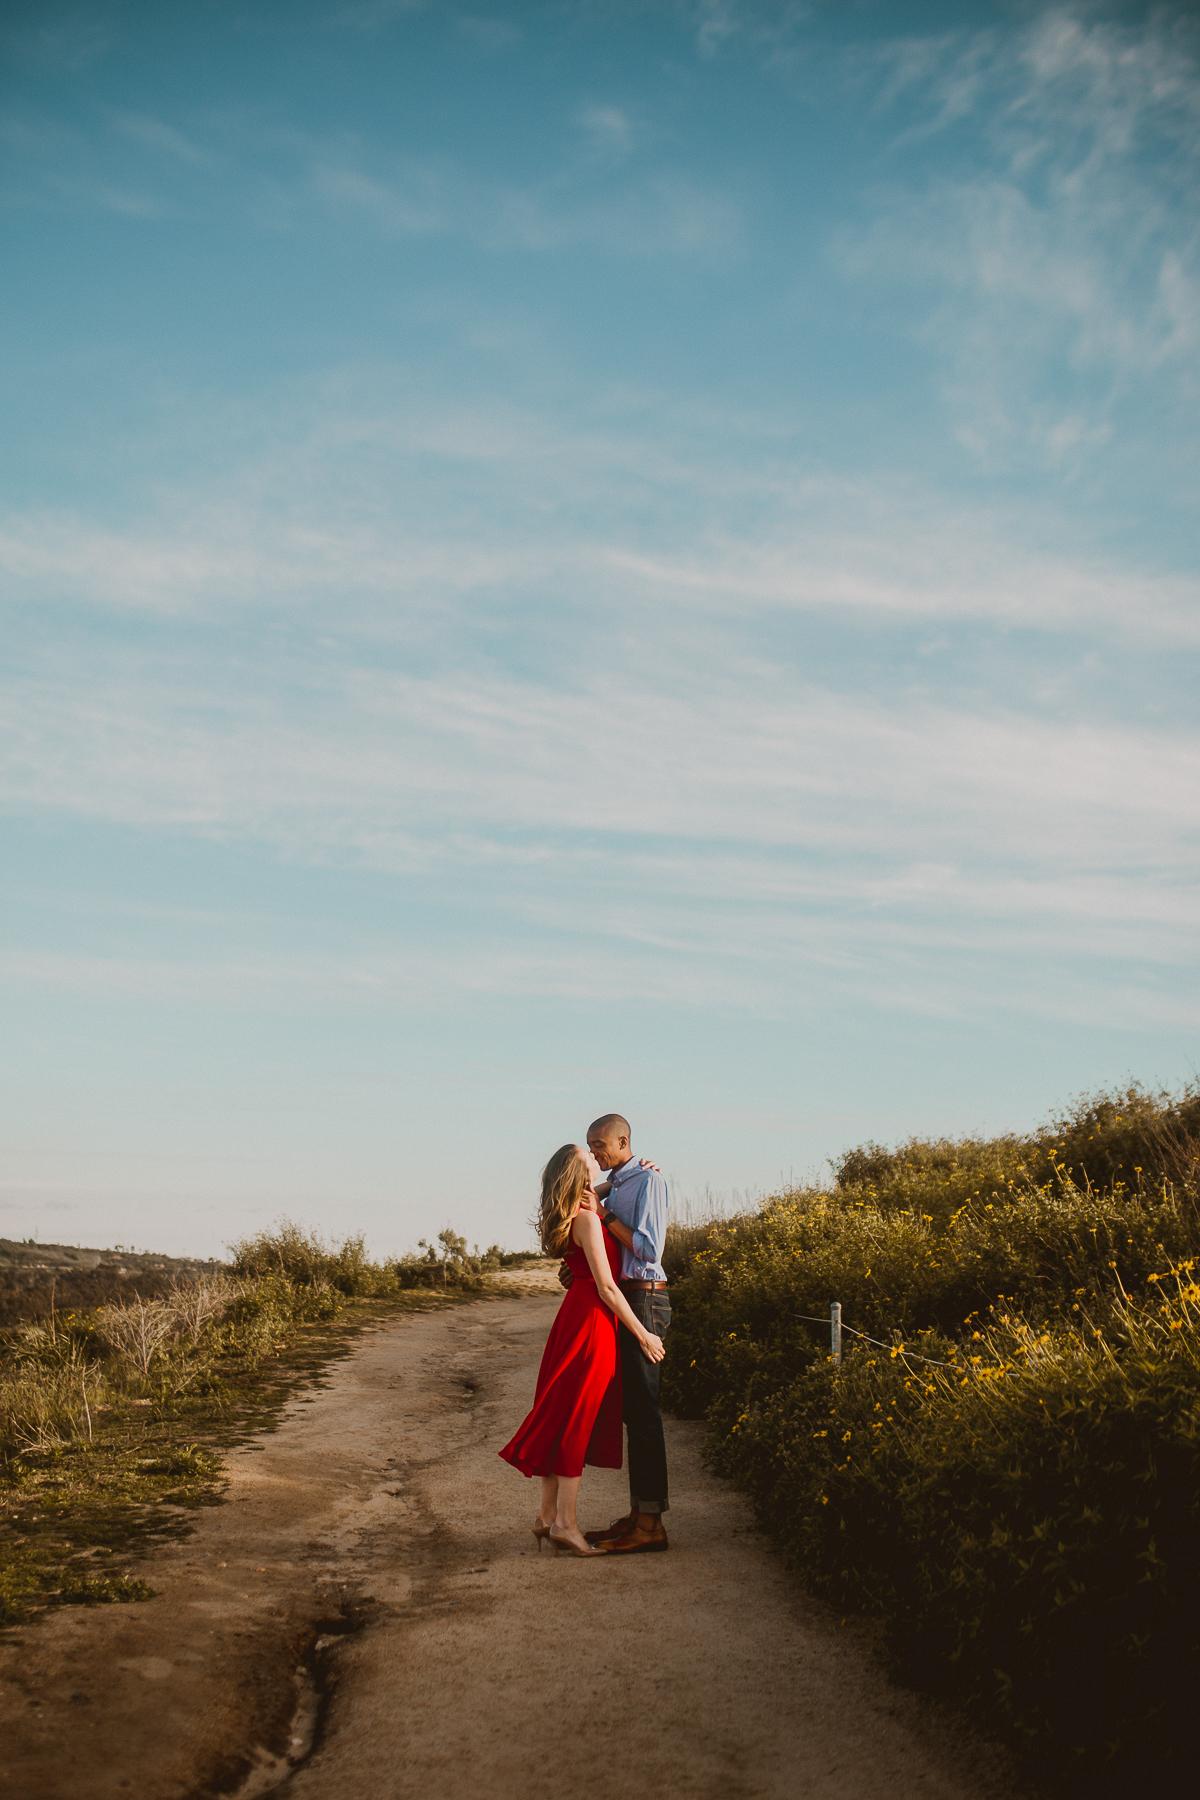 mar-vista-baldwin-hills-scenic-overlook-engagement-kelley-raye-los-angeles-wedding-photographer-112.jpg